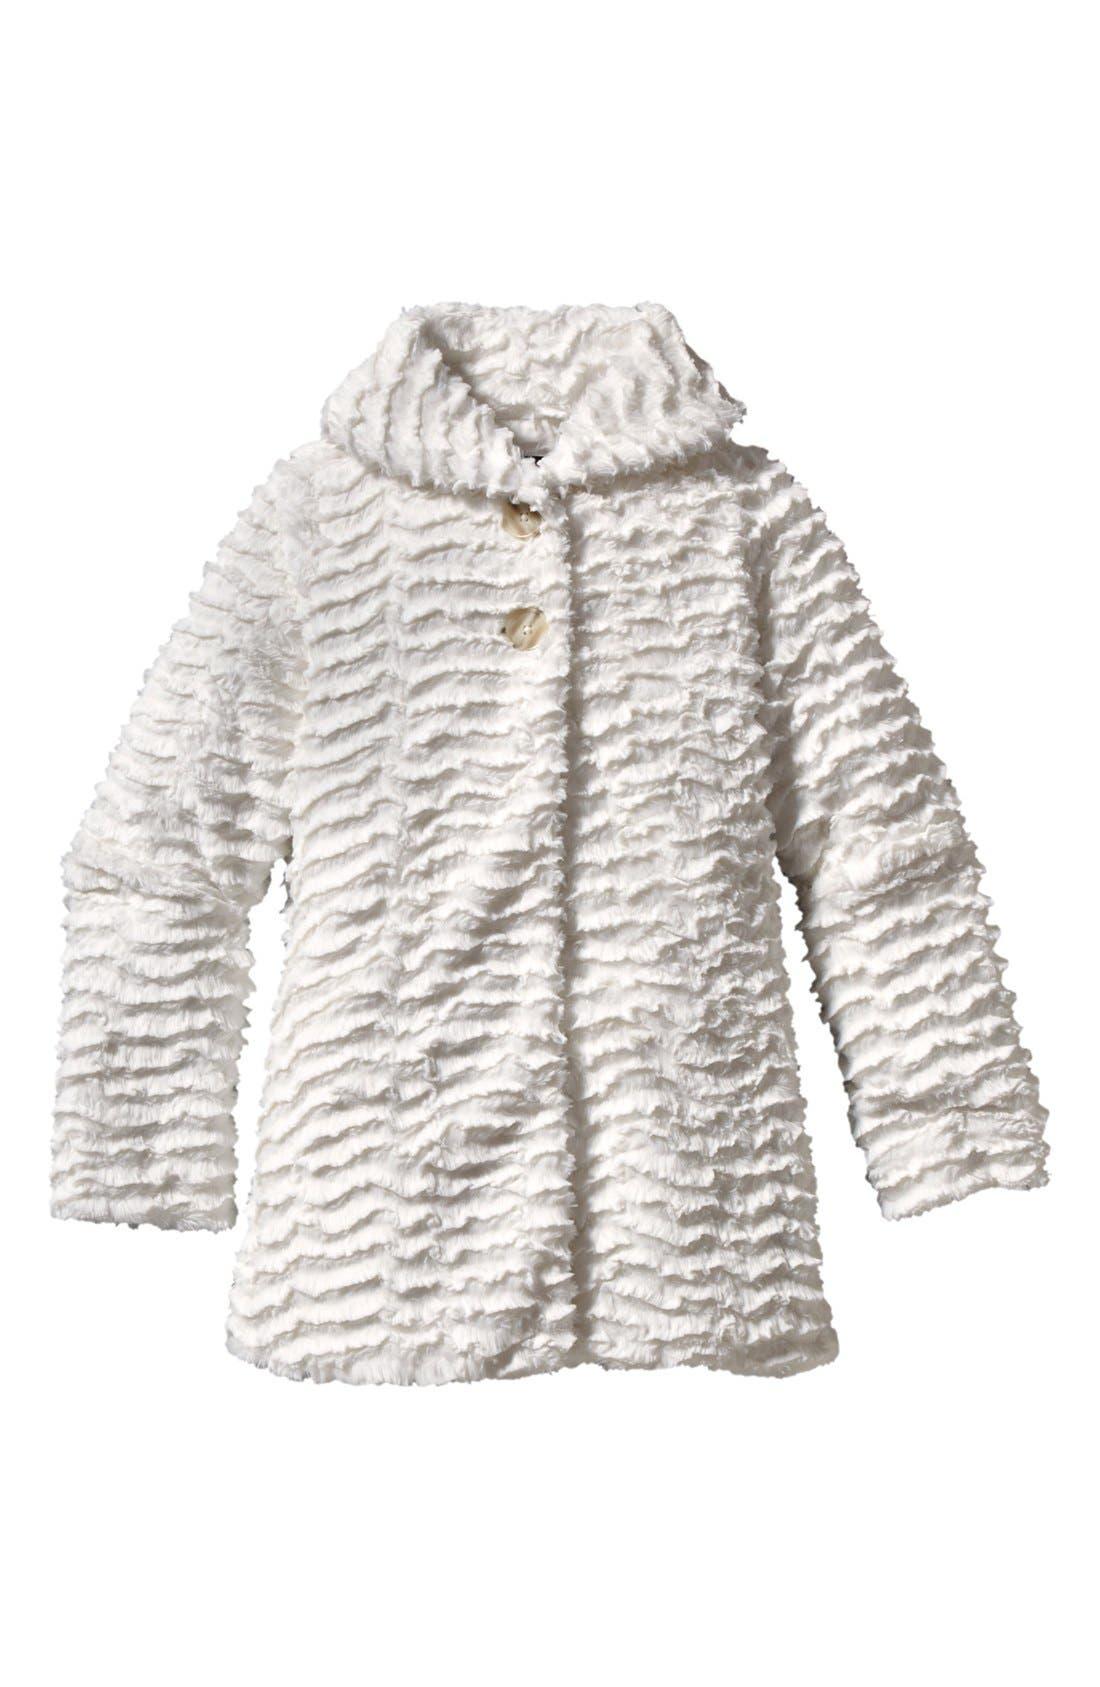 Alternate Image 1 Selected - Patagonia 'Pelage' Jacket (Big Girls)